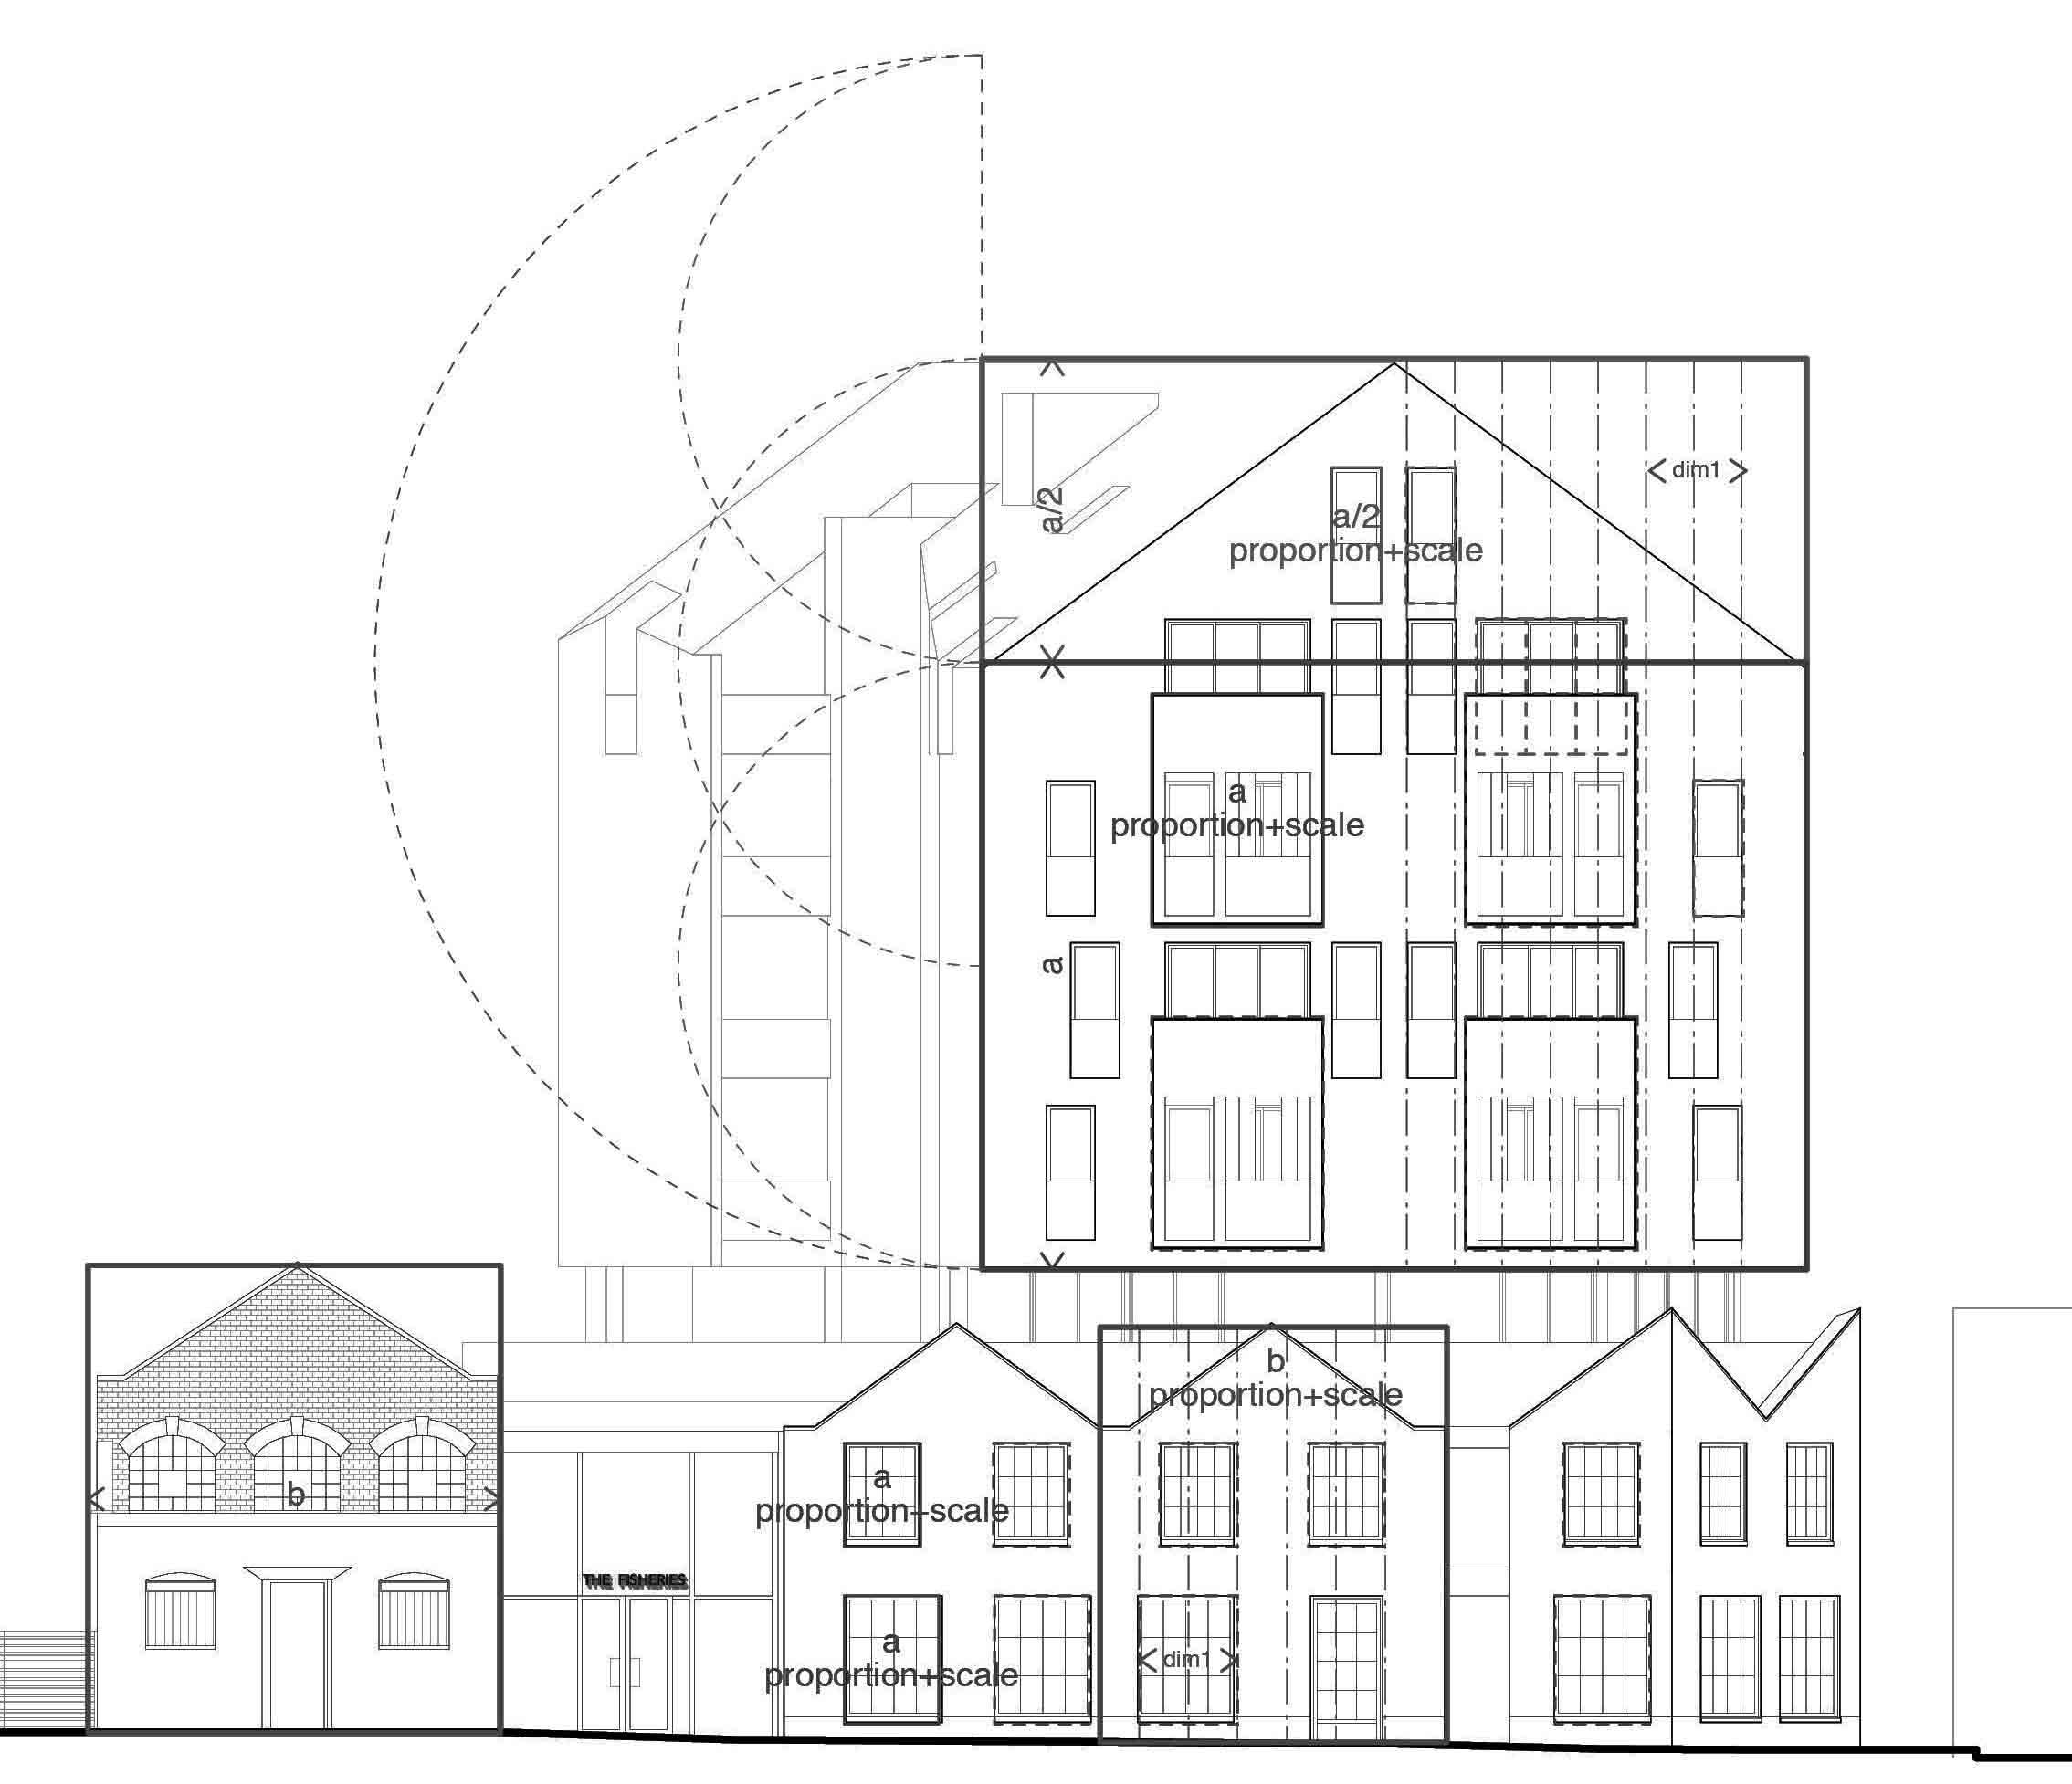 Street elevation diagram.